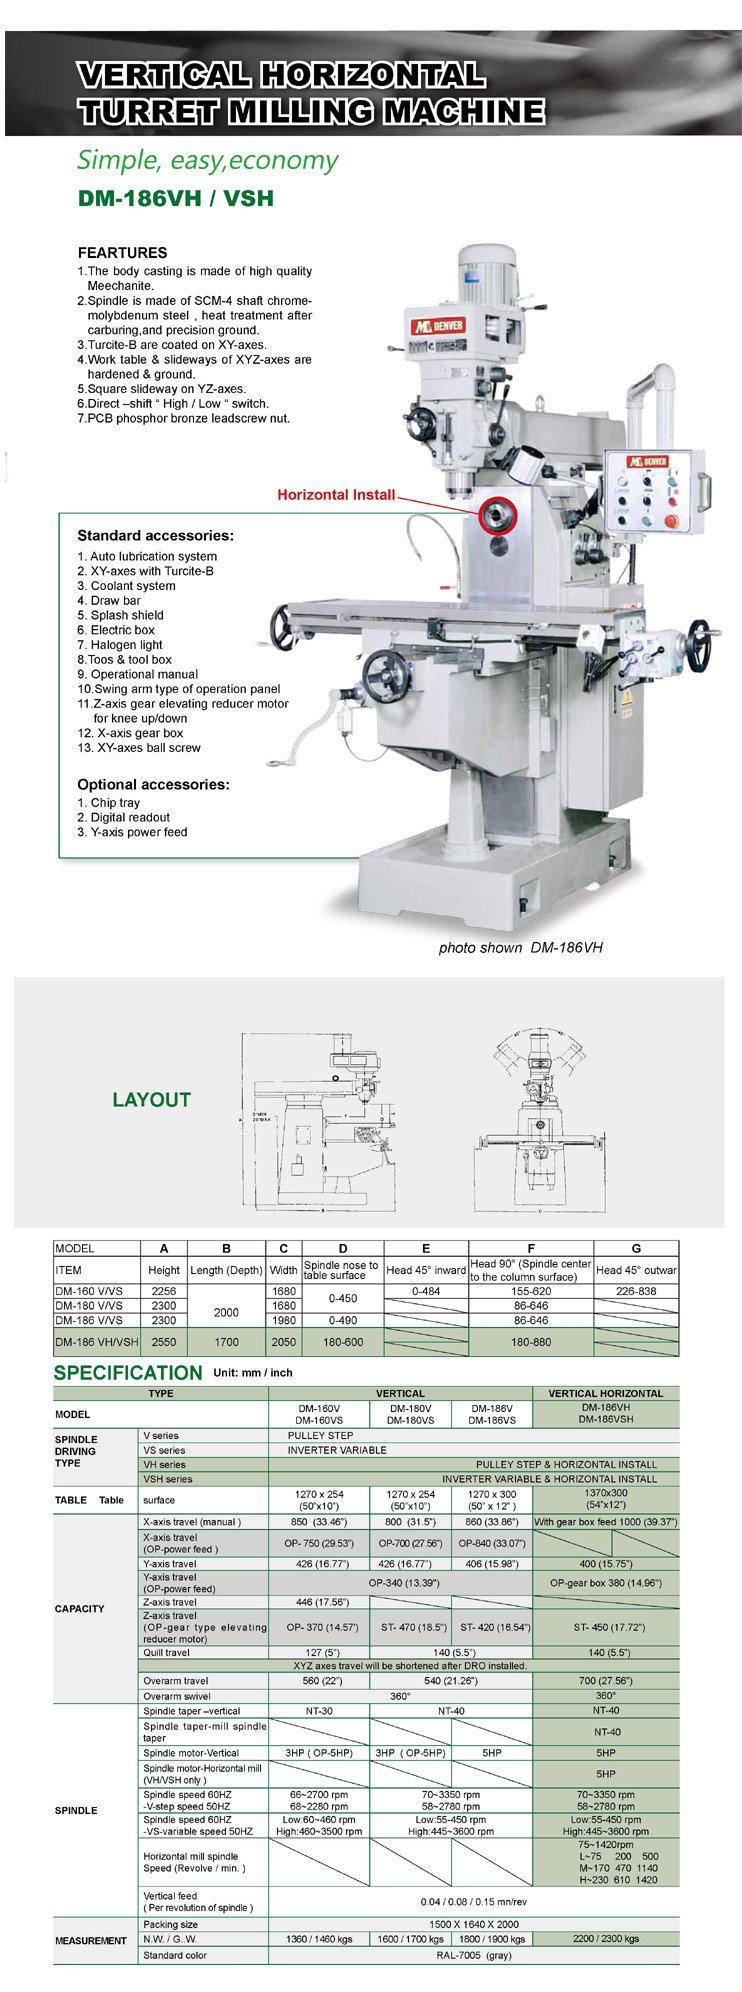 Vertical Horizontal milling machine | Turret Vertical